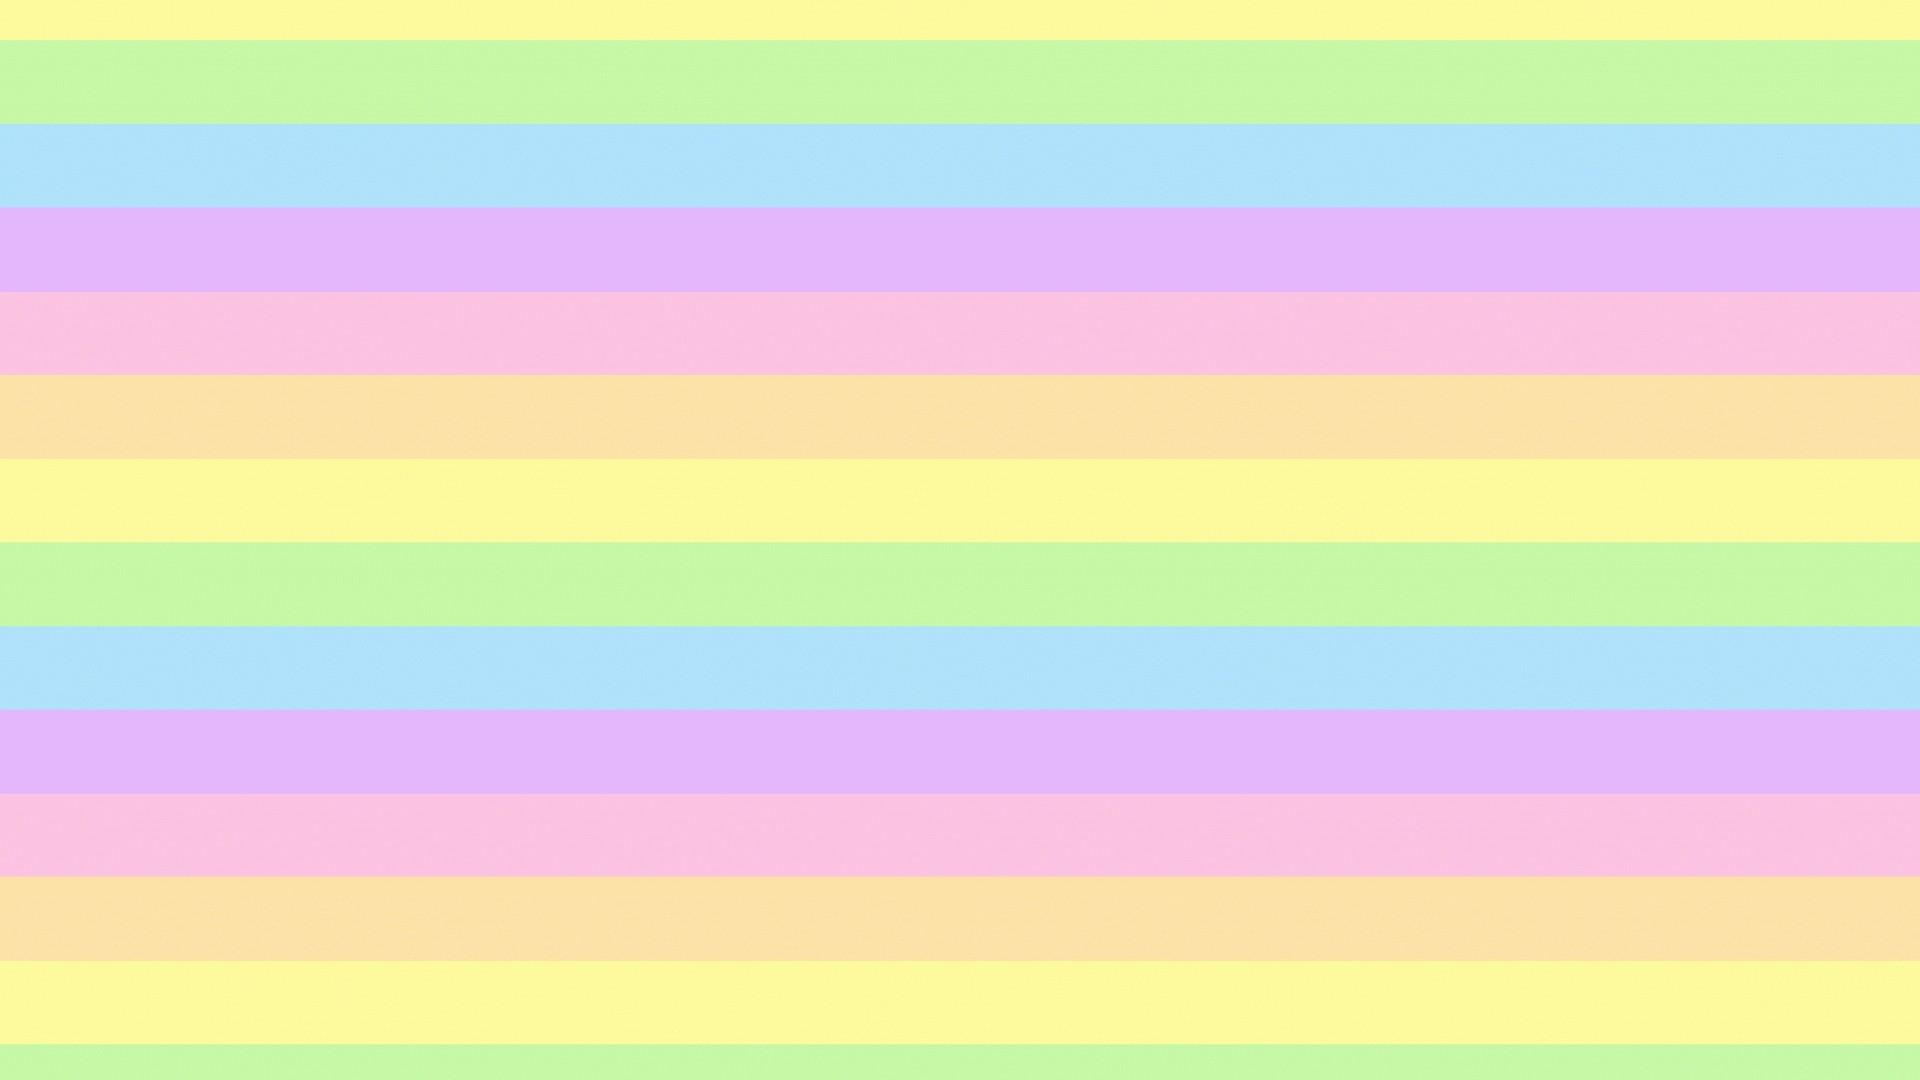 Pastel Color Background Wallpaper